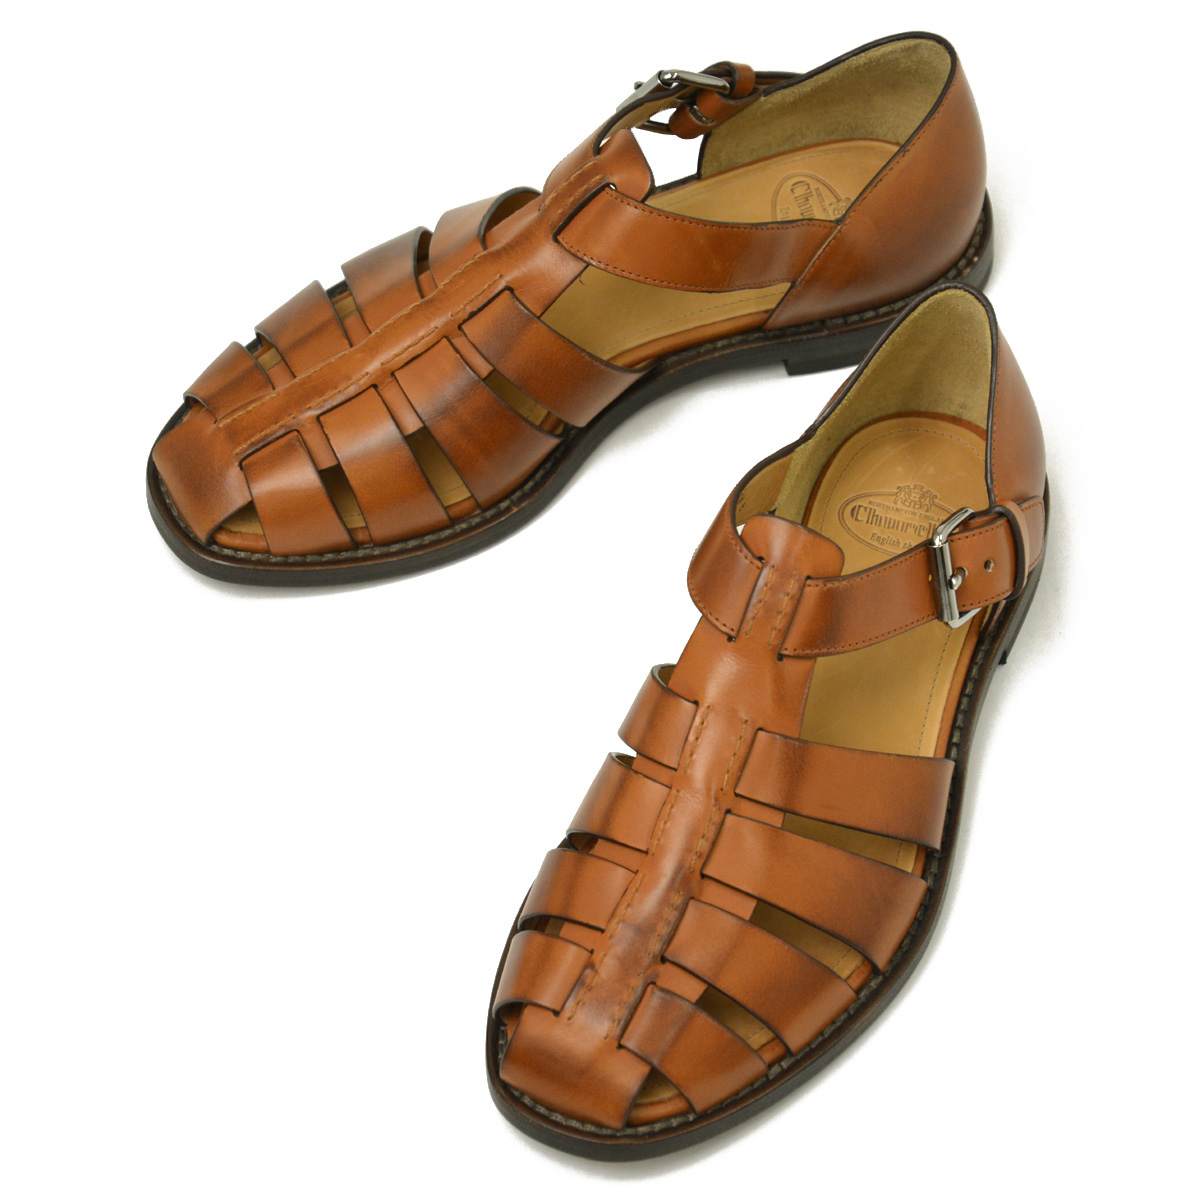 Church' s fisherman sandals